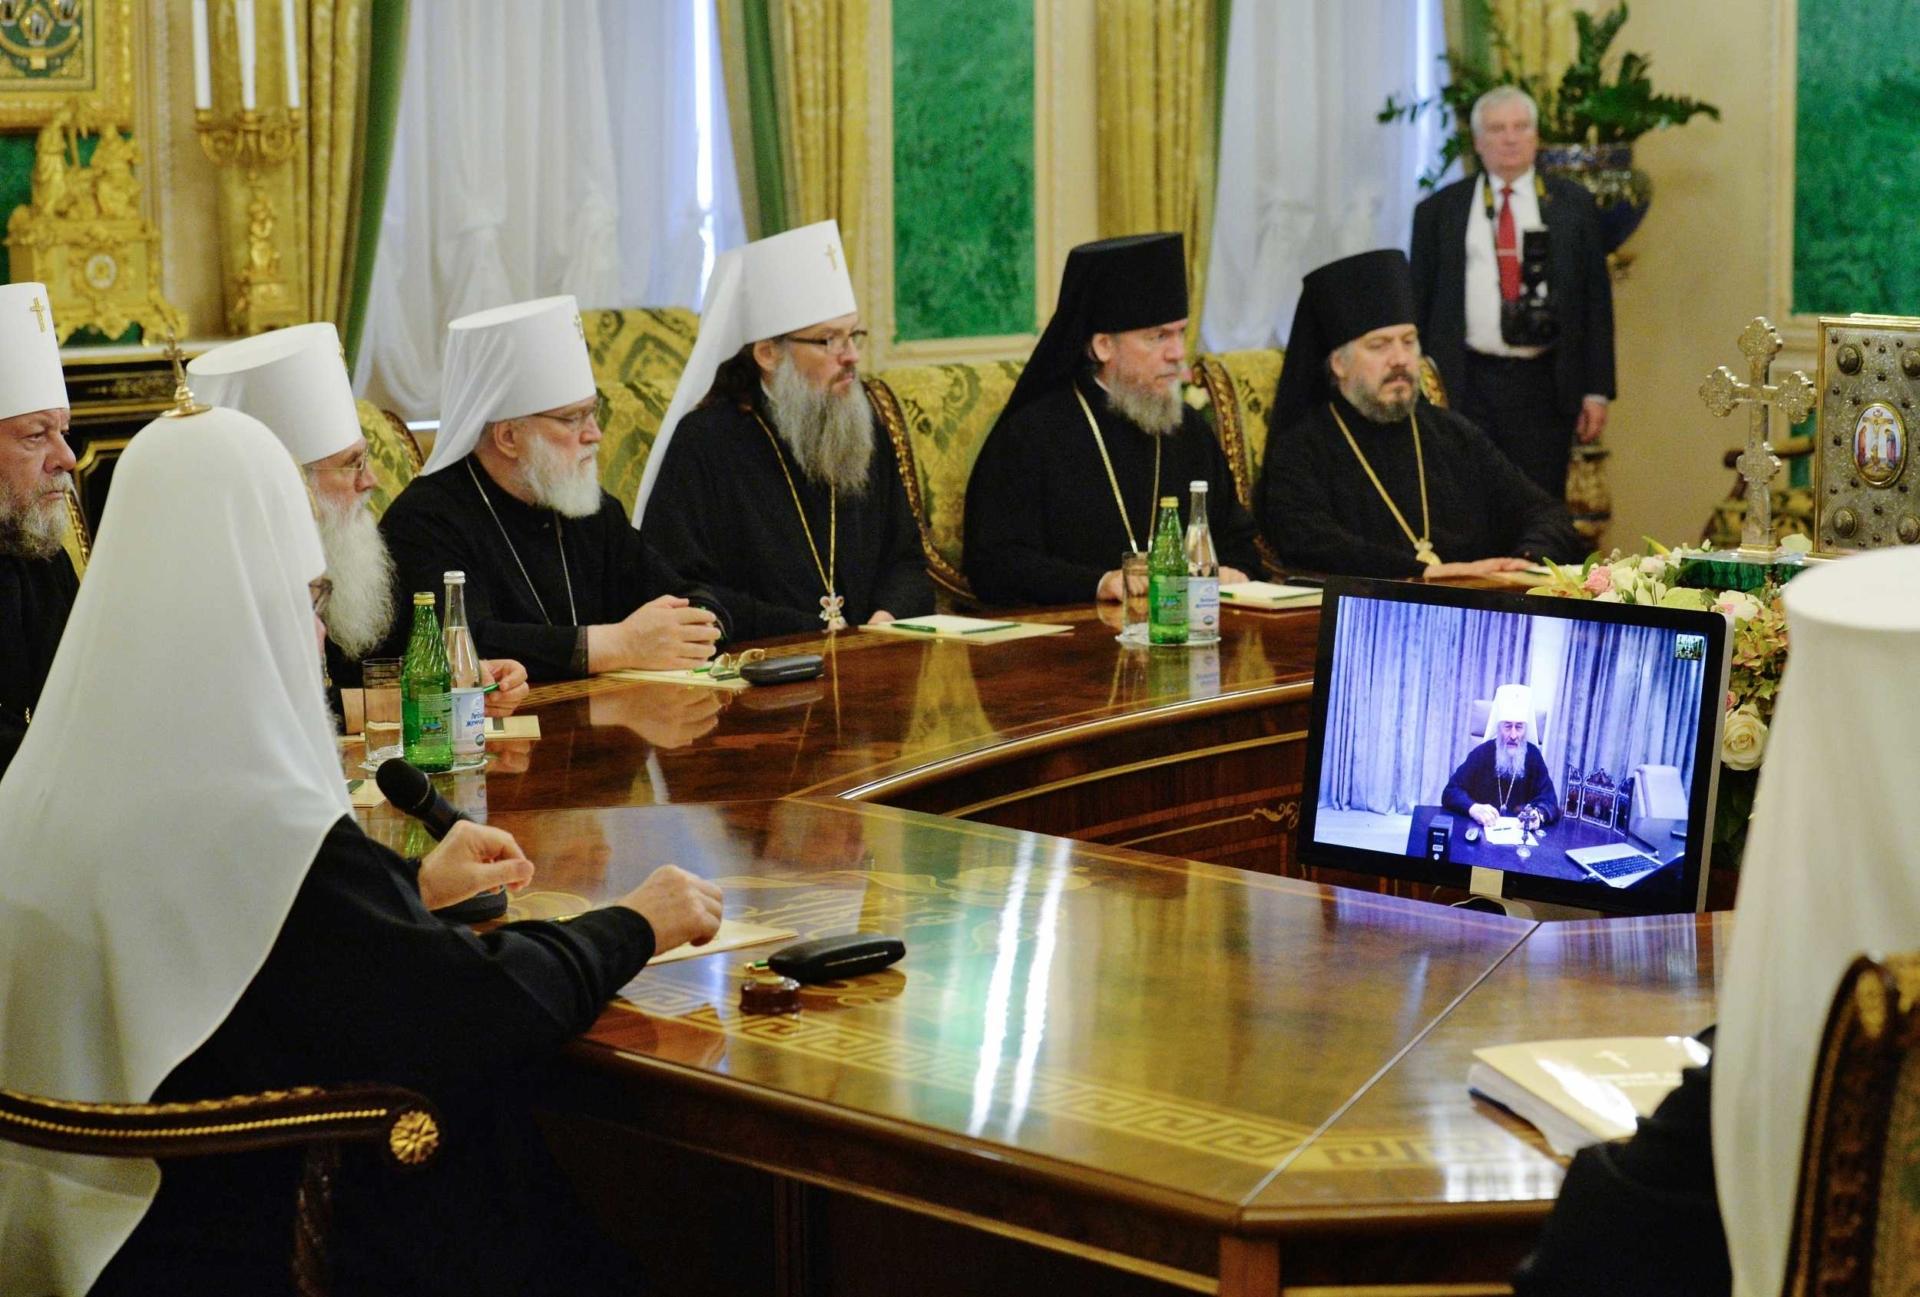 РПЦ/УПЦ припинила стосунки з єпископатом Константинопольської Церкви через Україну